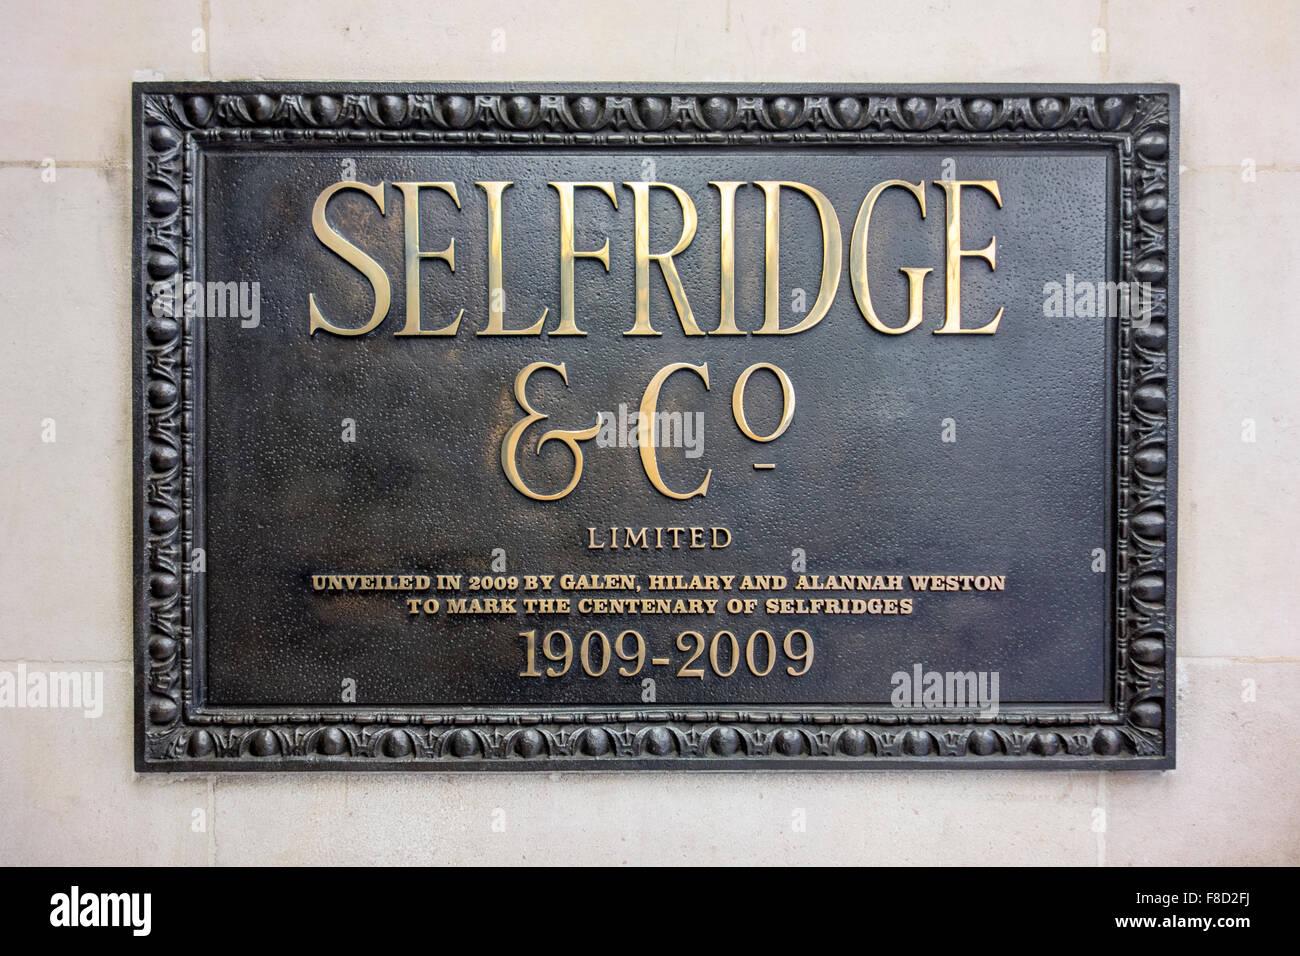 Selfridges London - Selfridge & Co sign, Oxford Street, London - Stock Image